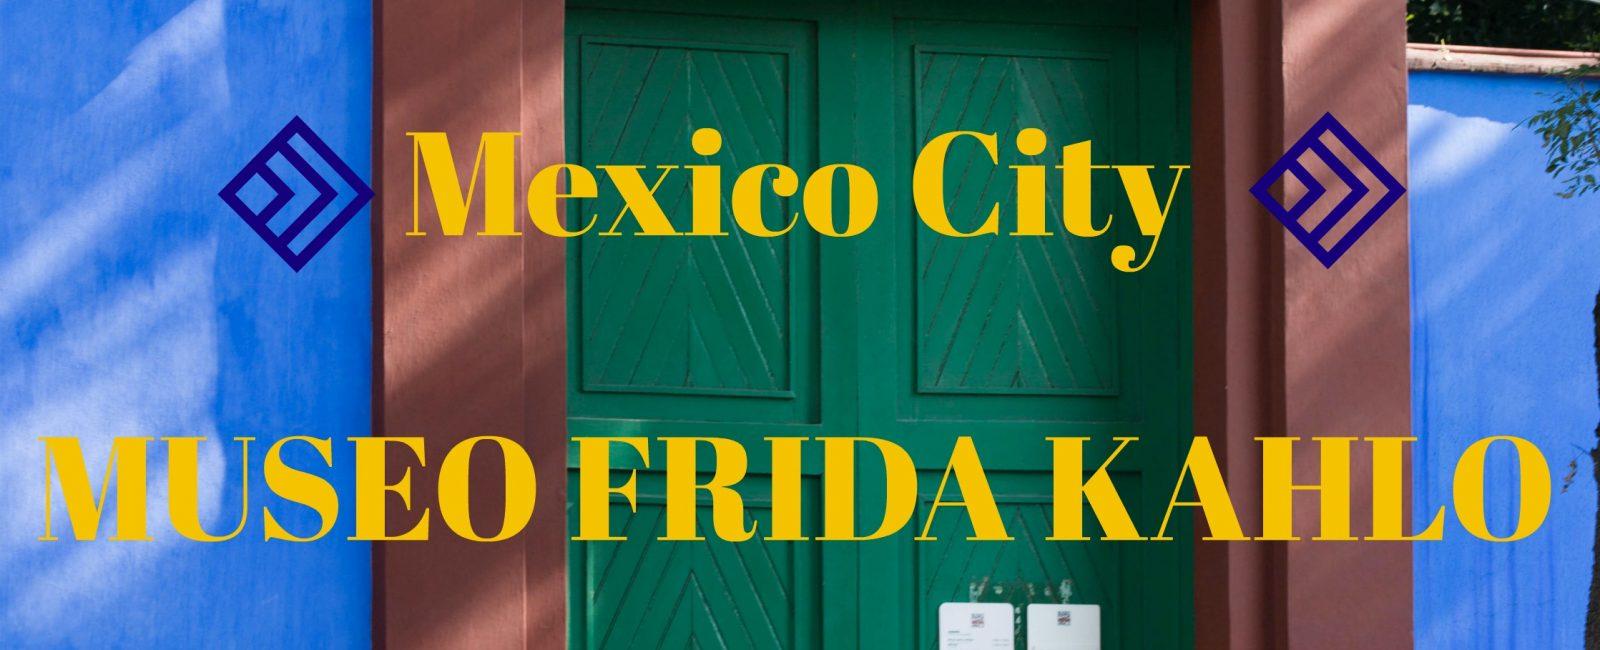 Mexico City – Museum Frida Kahlo besuchen